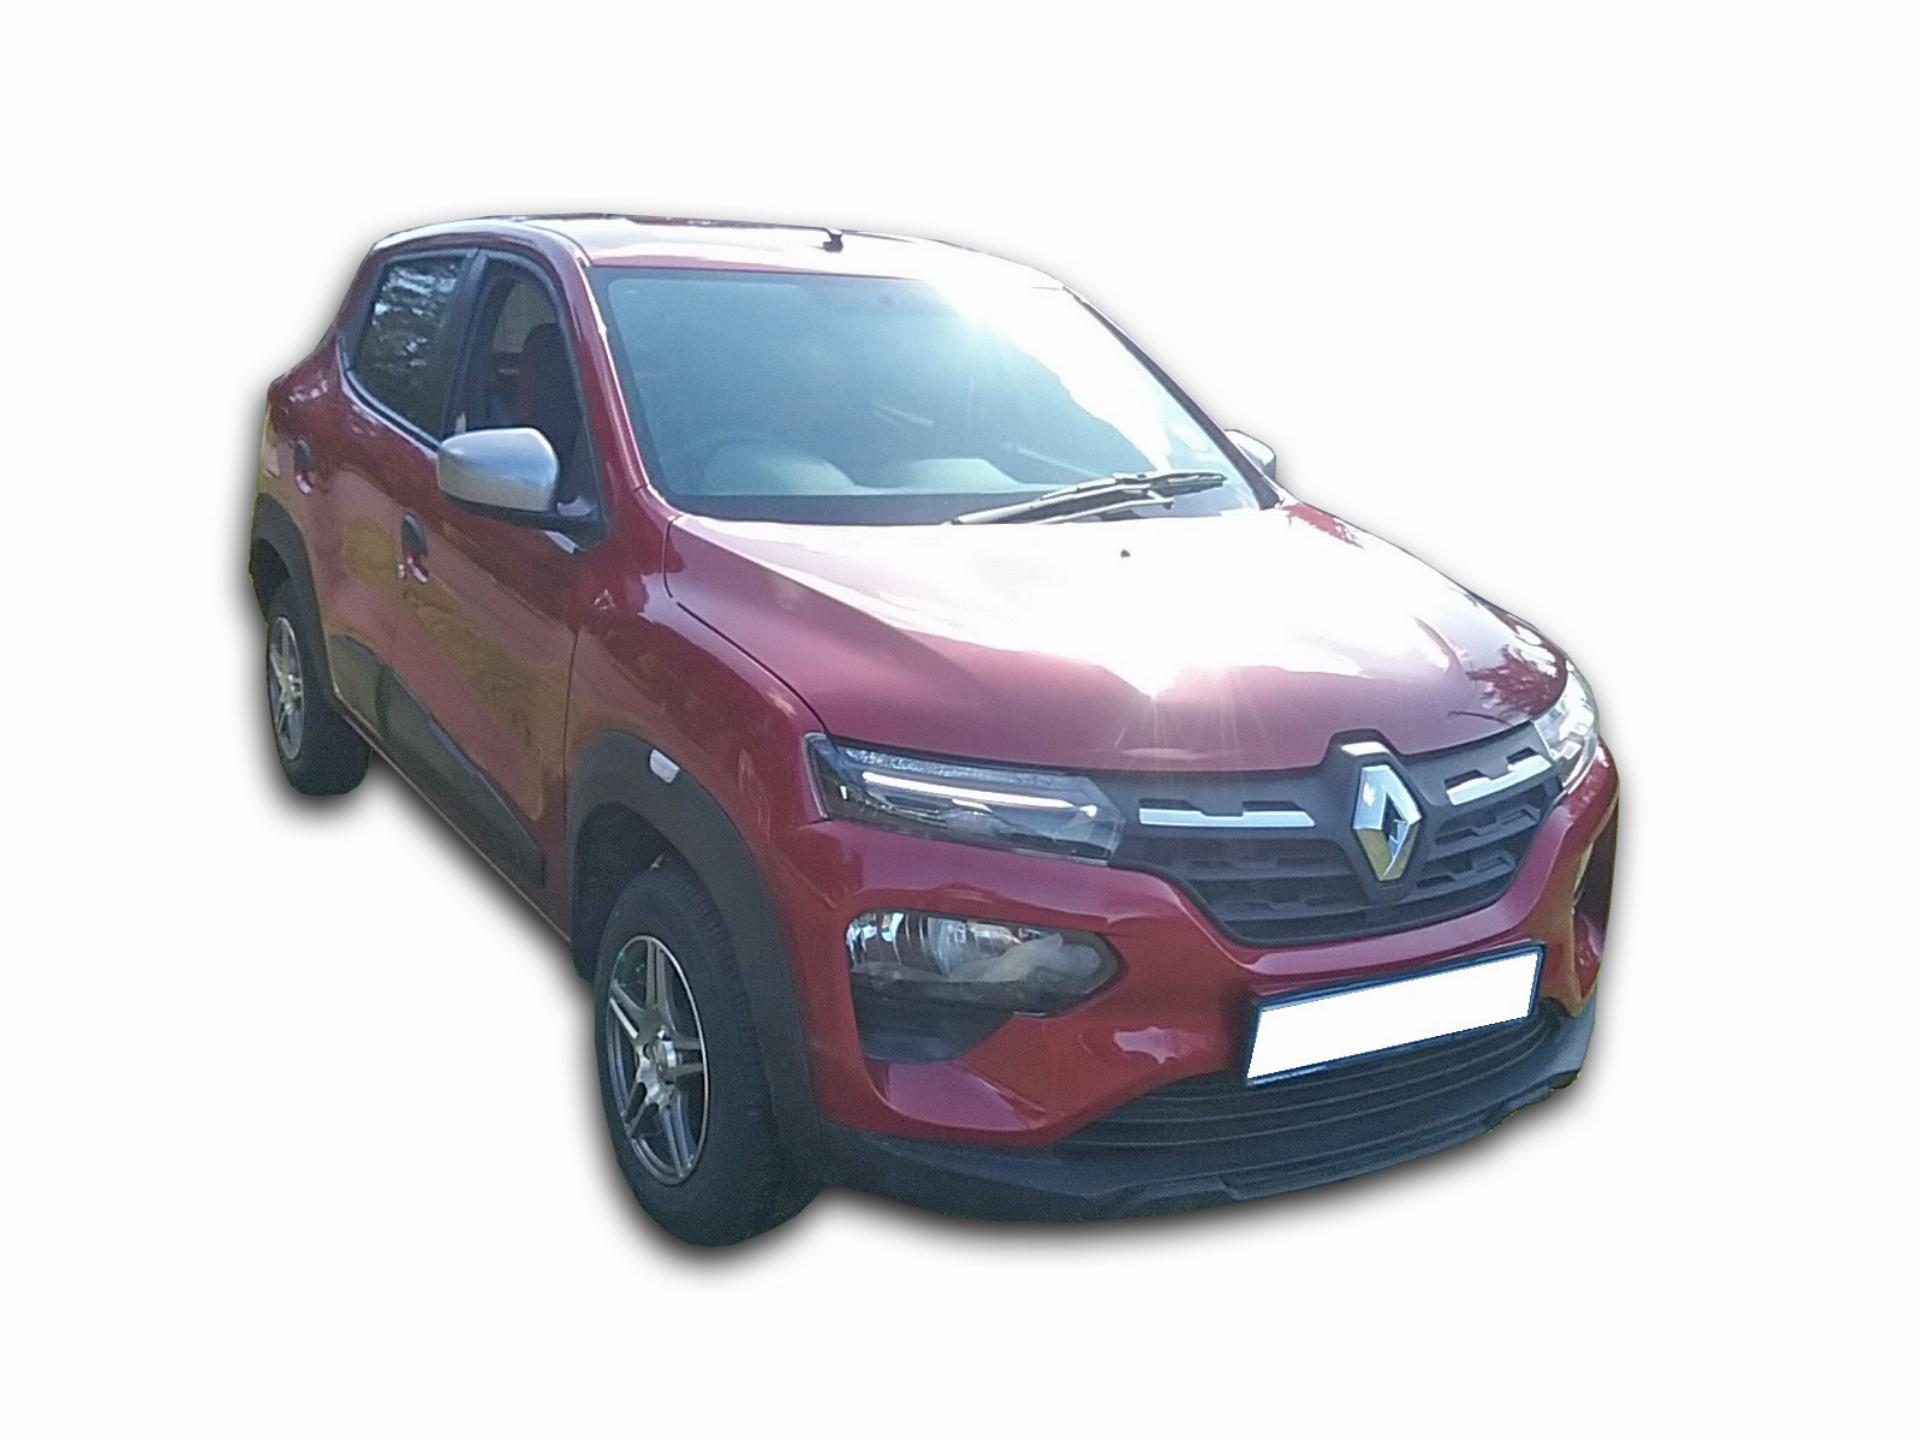 Renault Kwid 1.0 Dynamic Automatic